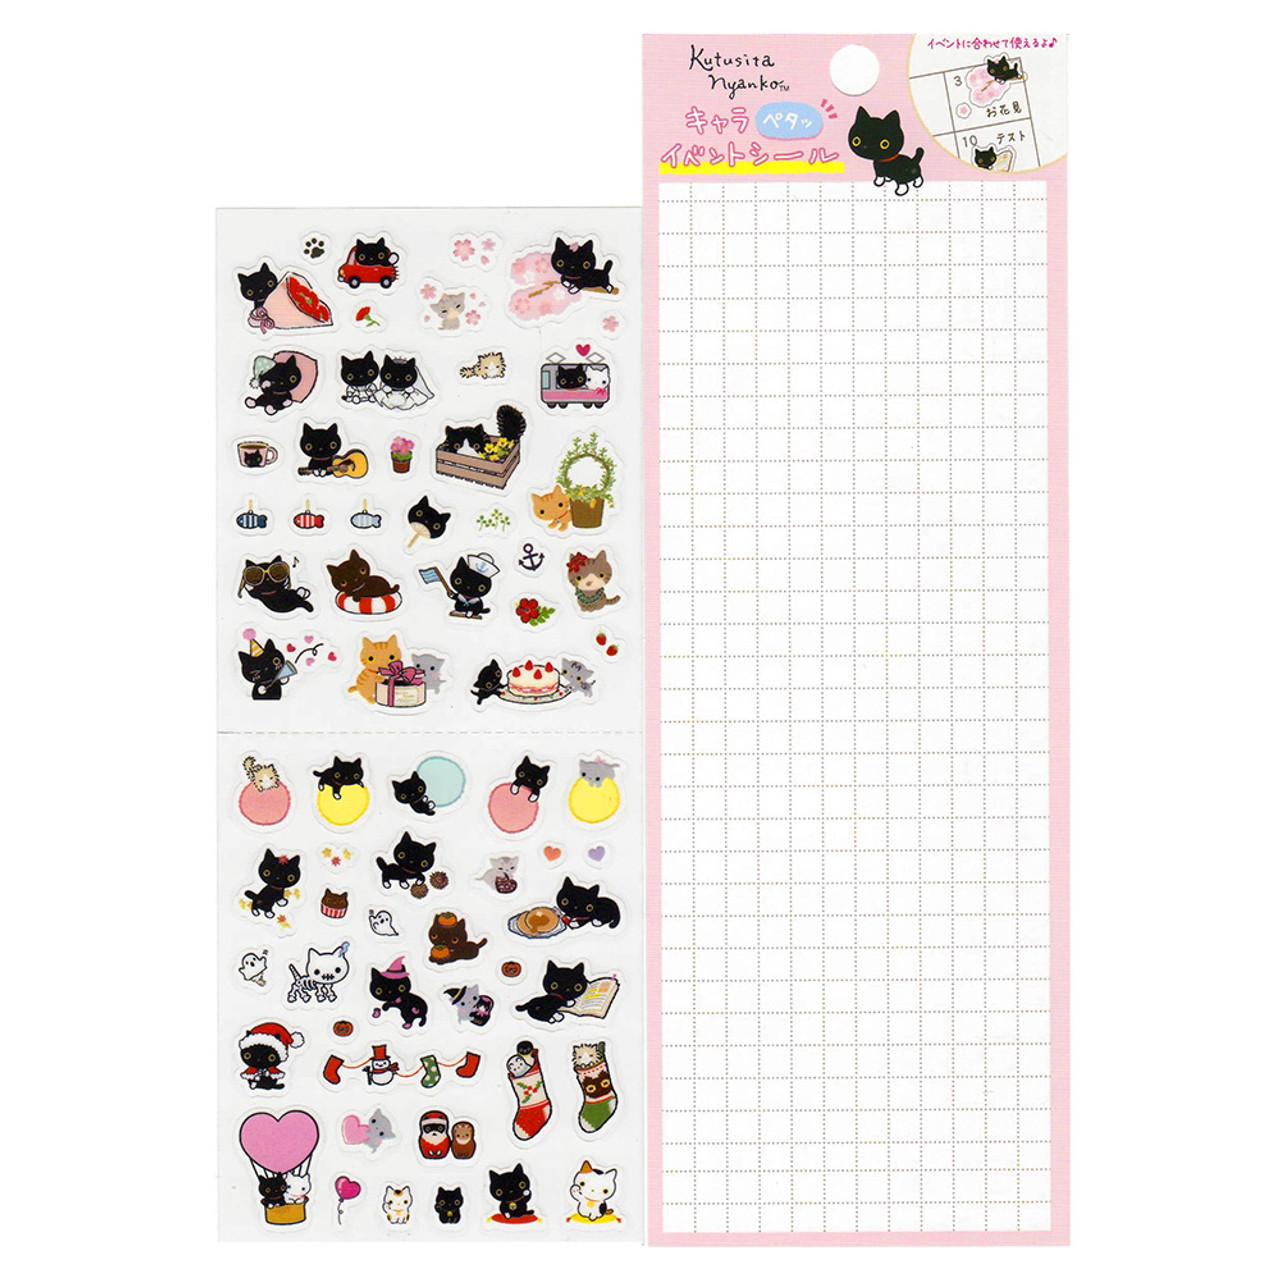 San-X Kutusita Nyanko Socks Black Cat Events Schedule Sticker SE30606 ( Feature 01 )